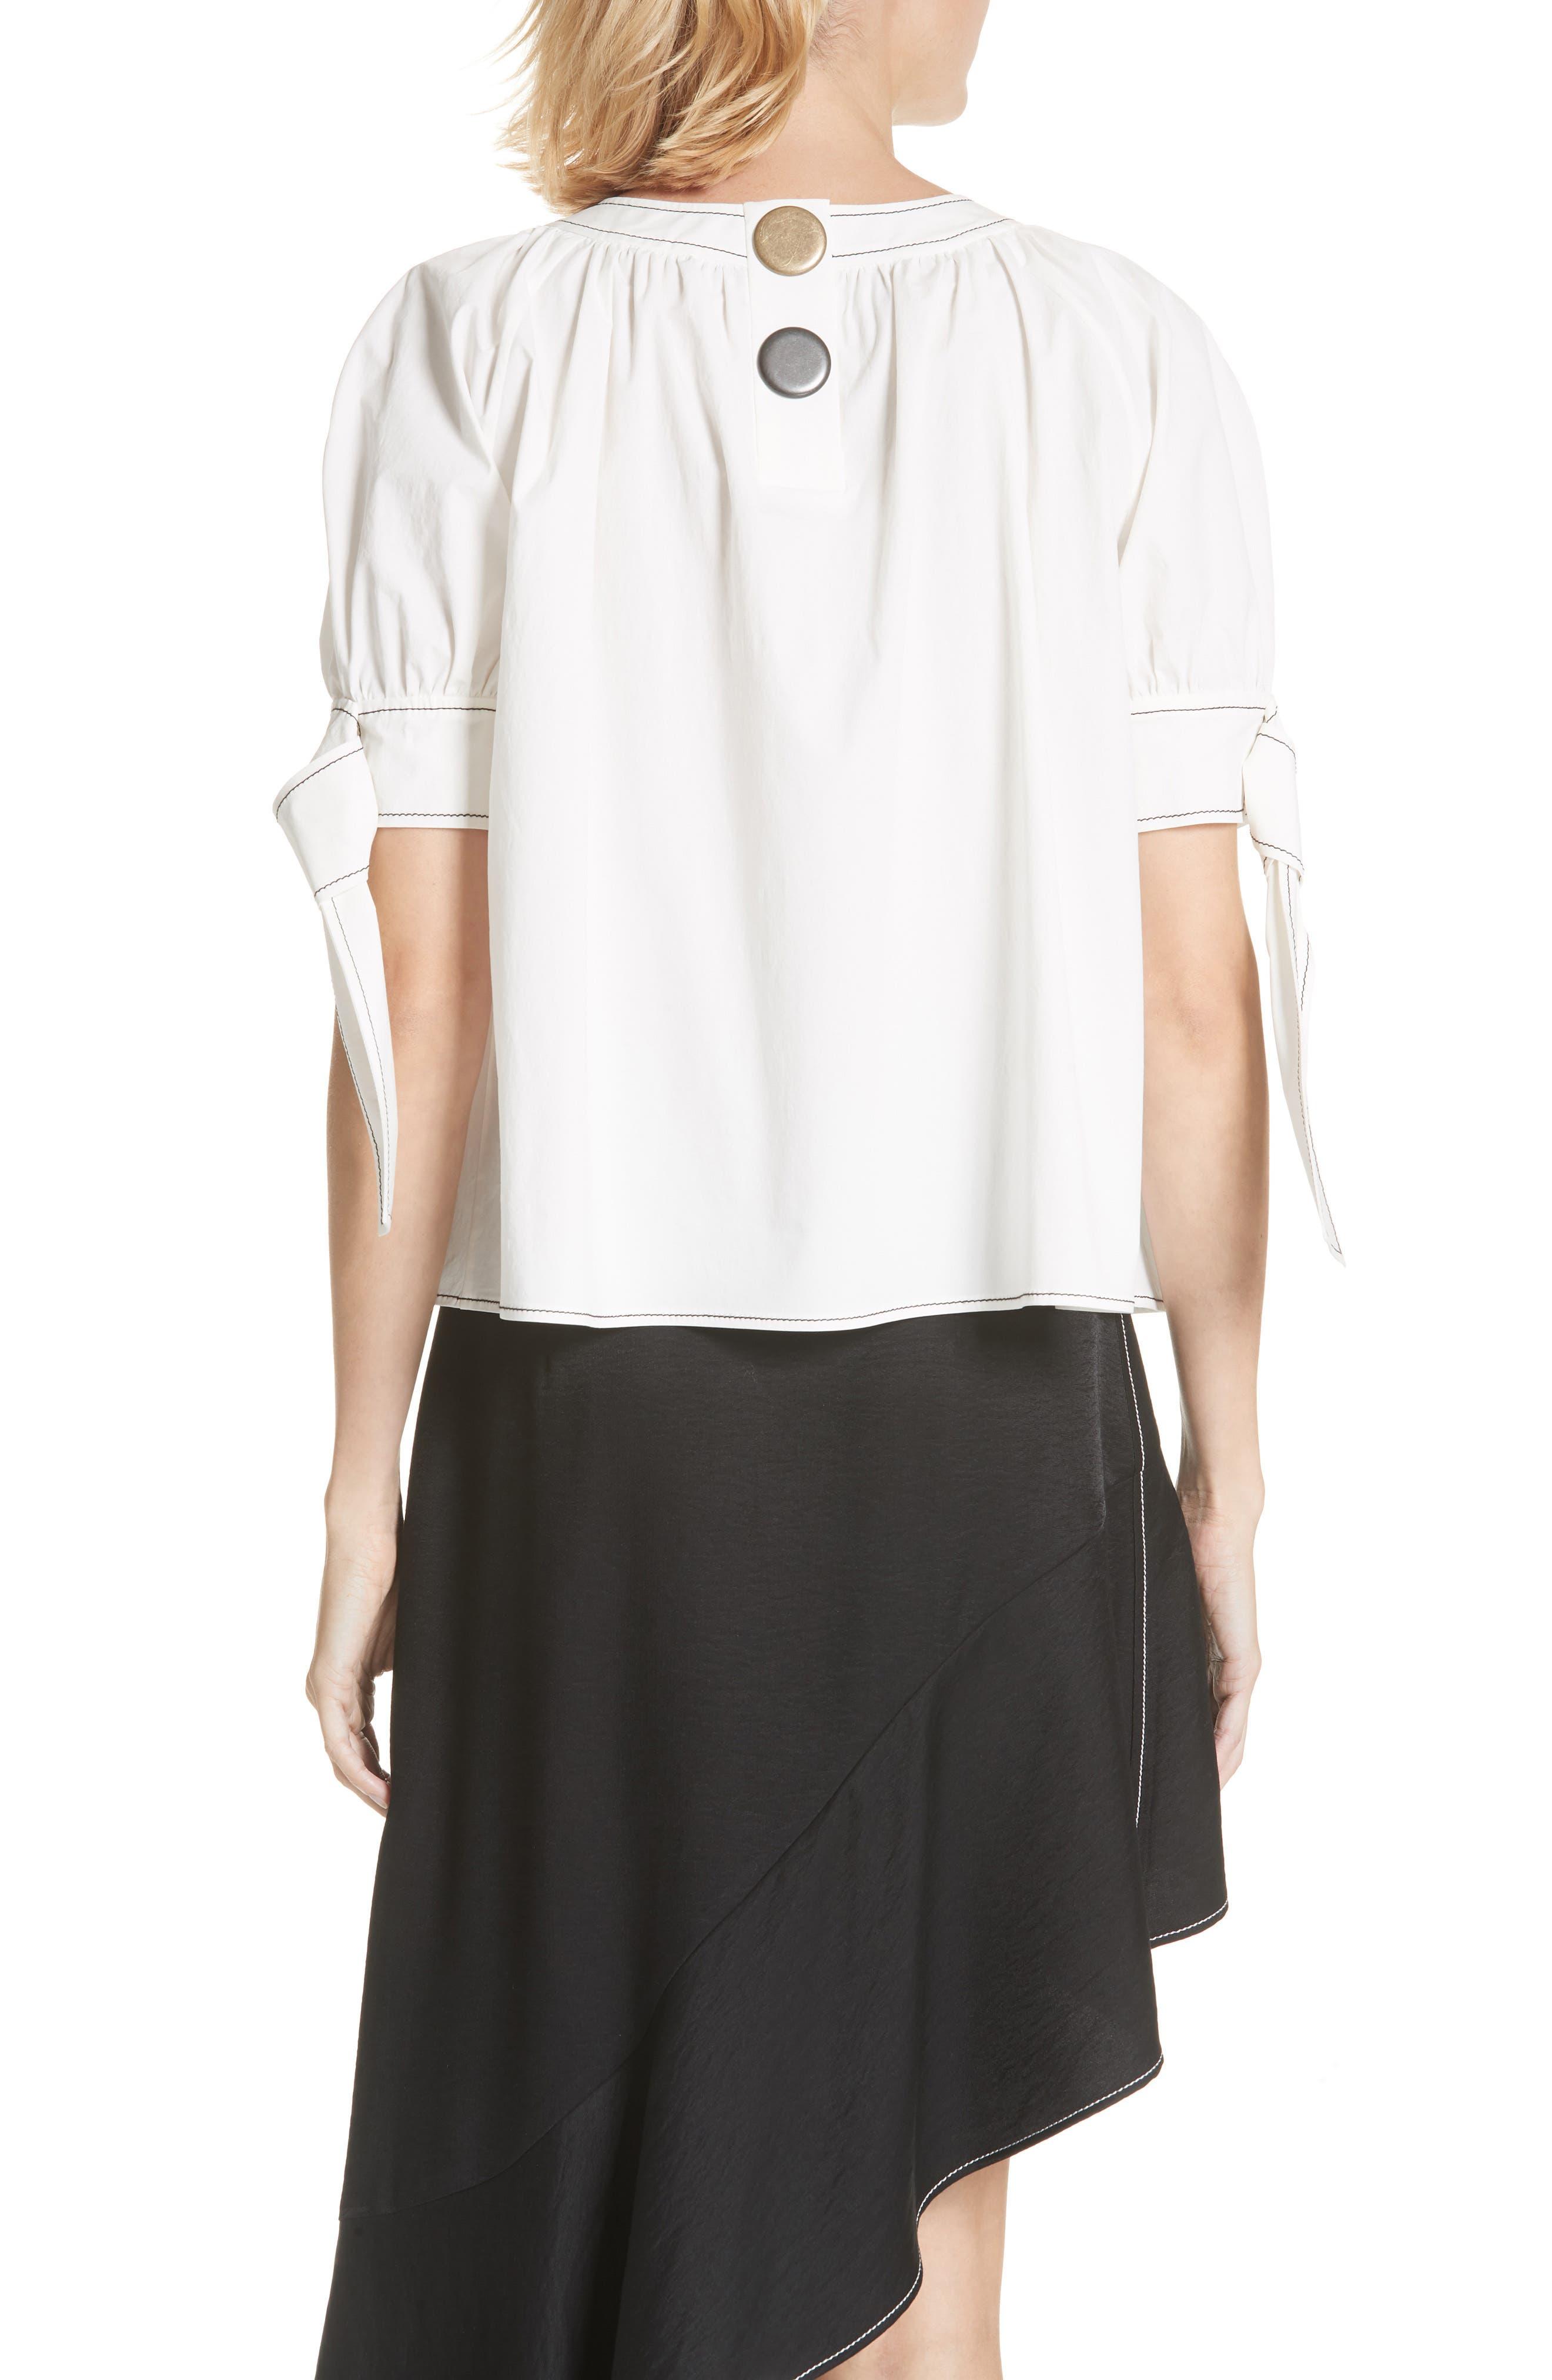 Hailey Short Sleeve Blouse Top,                             Alternate thumbnail 2, color,                             Cotton White